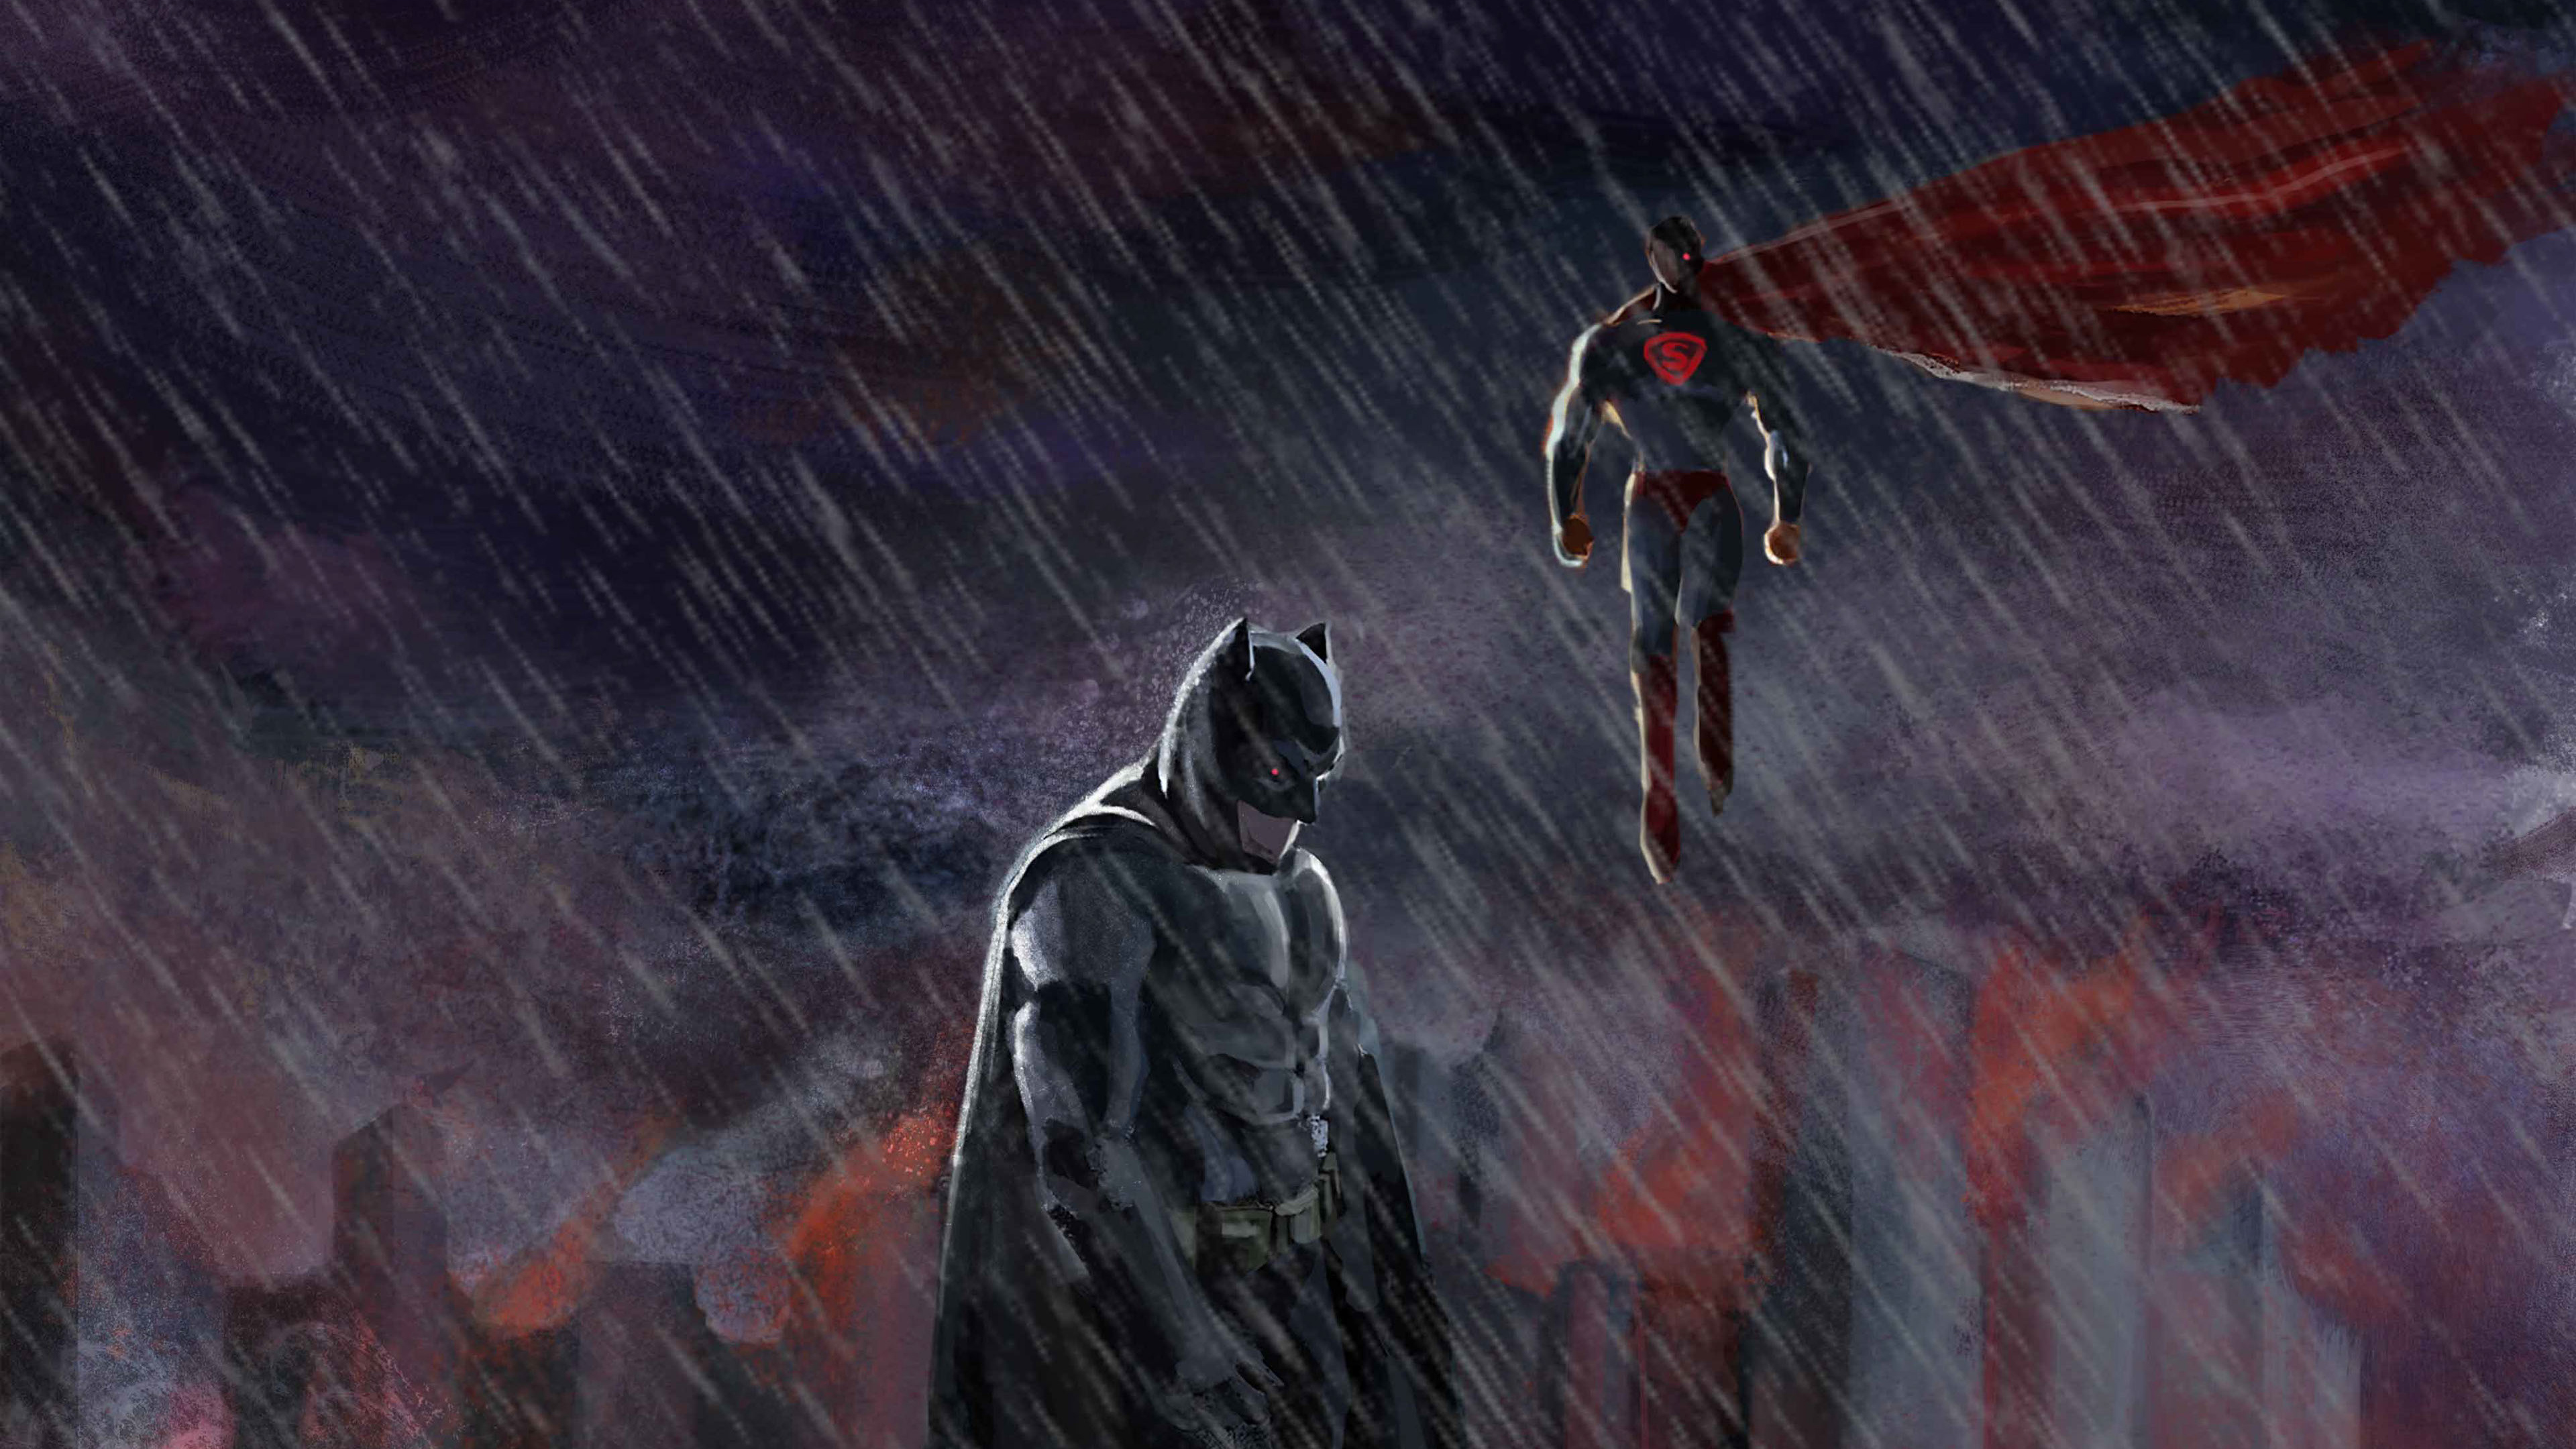 batman and superman 4k 1554245047 - Batman And Superman 4k - superman wallpapers, superheroes wallpapers, hd-wallpapers, digital art wallpapers, behance wallpapers, batman wallpapers, 4k-wallpapers